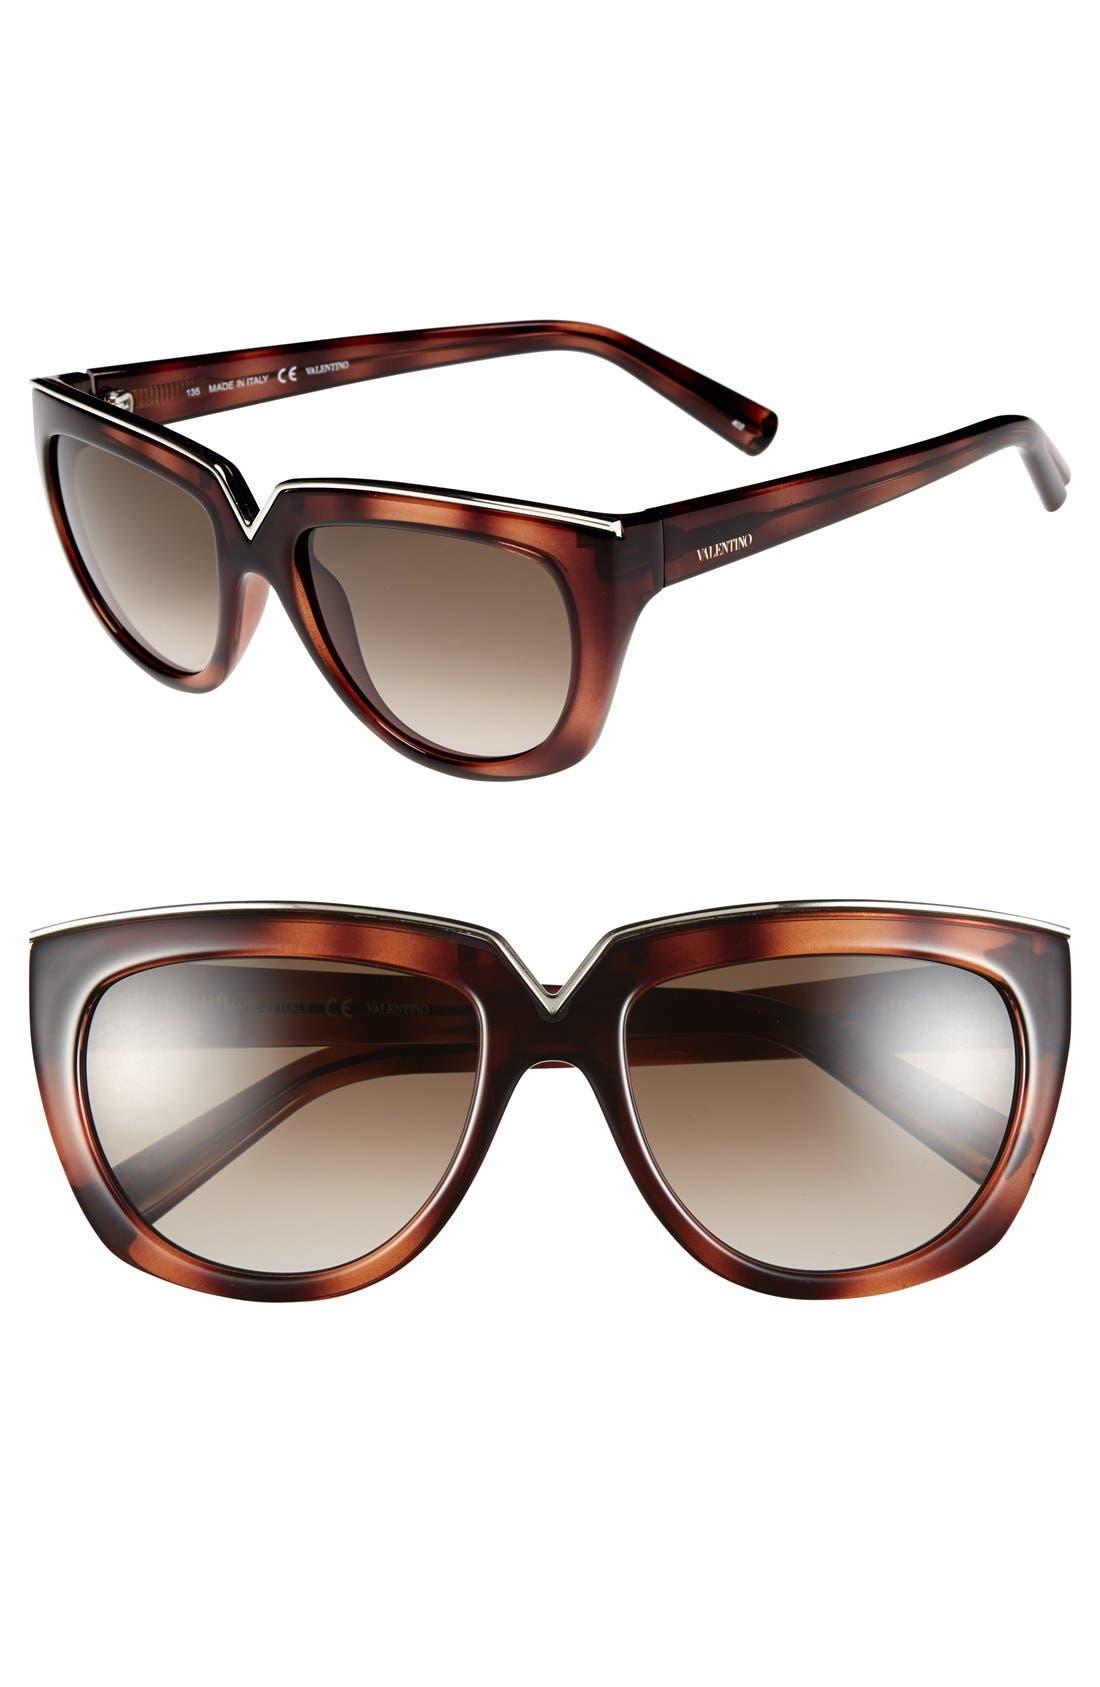 Alternate Image 1 Selected - Valentino 54mm Gradient Lens Sunglasses